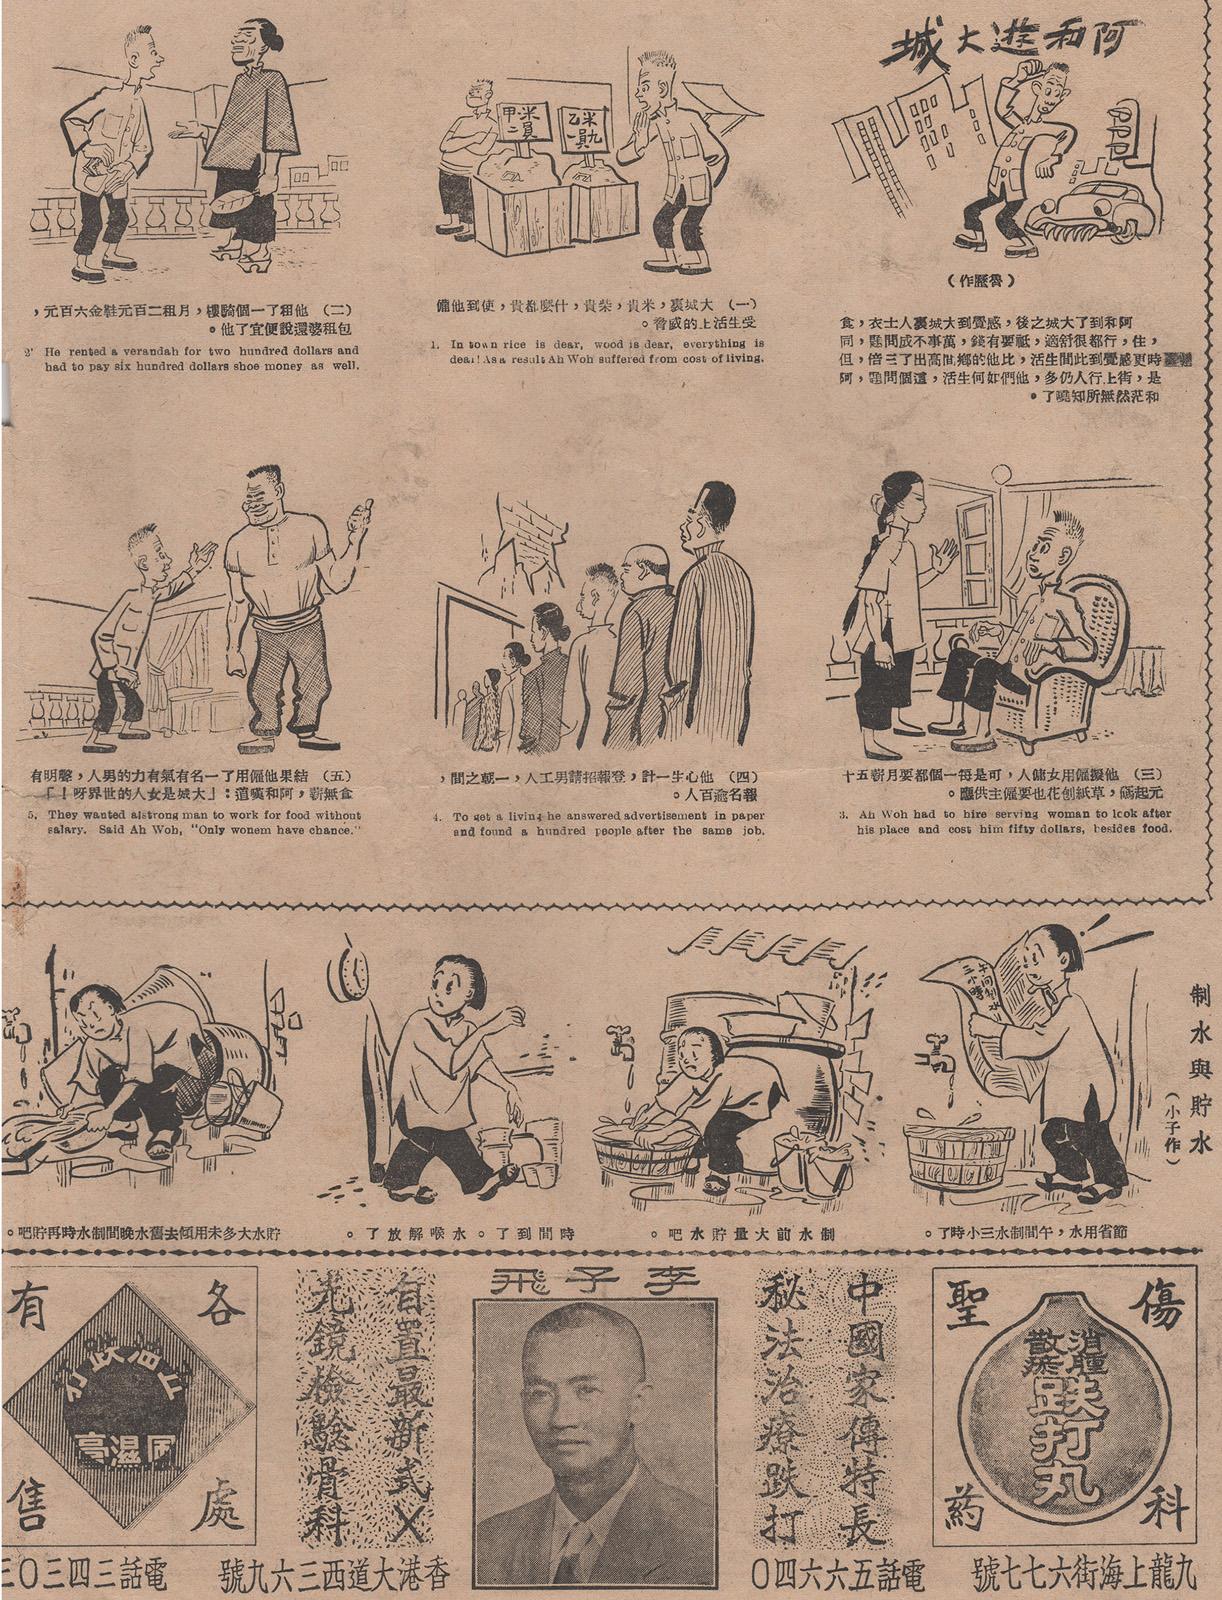 kurt-tong-photography-of-china-Combing For Ice and Jade07.jpg